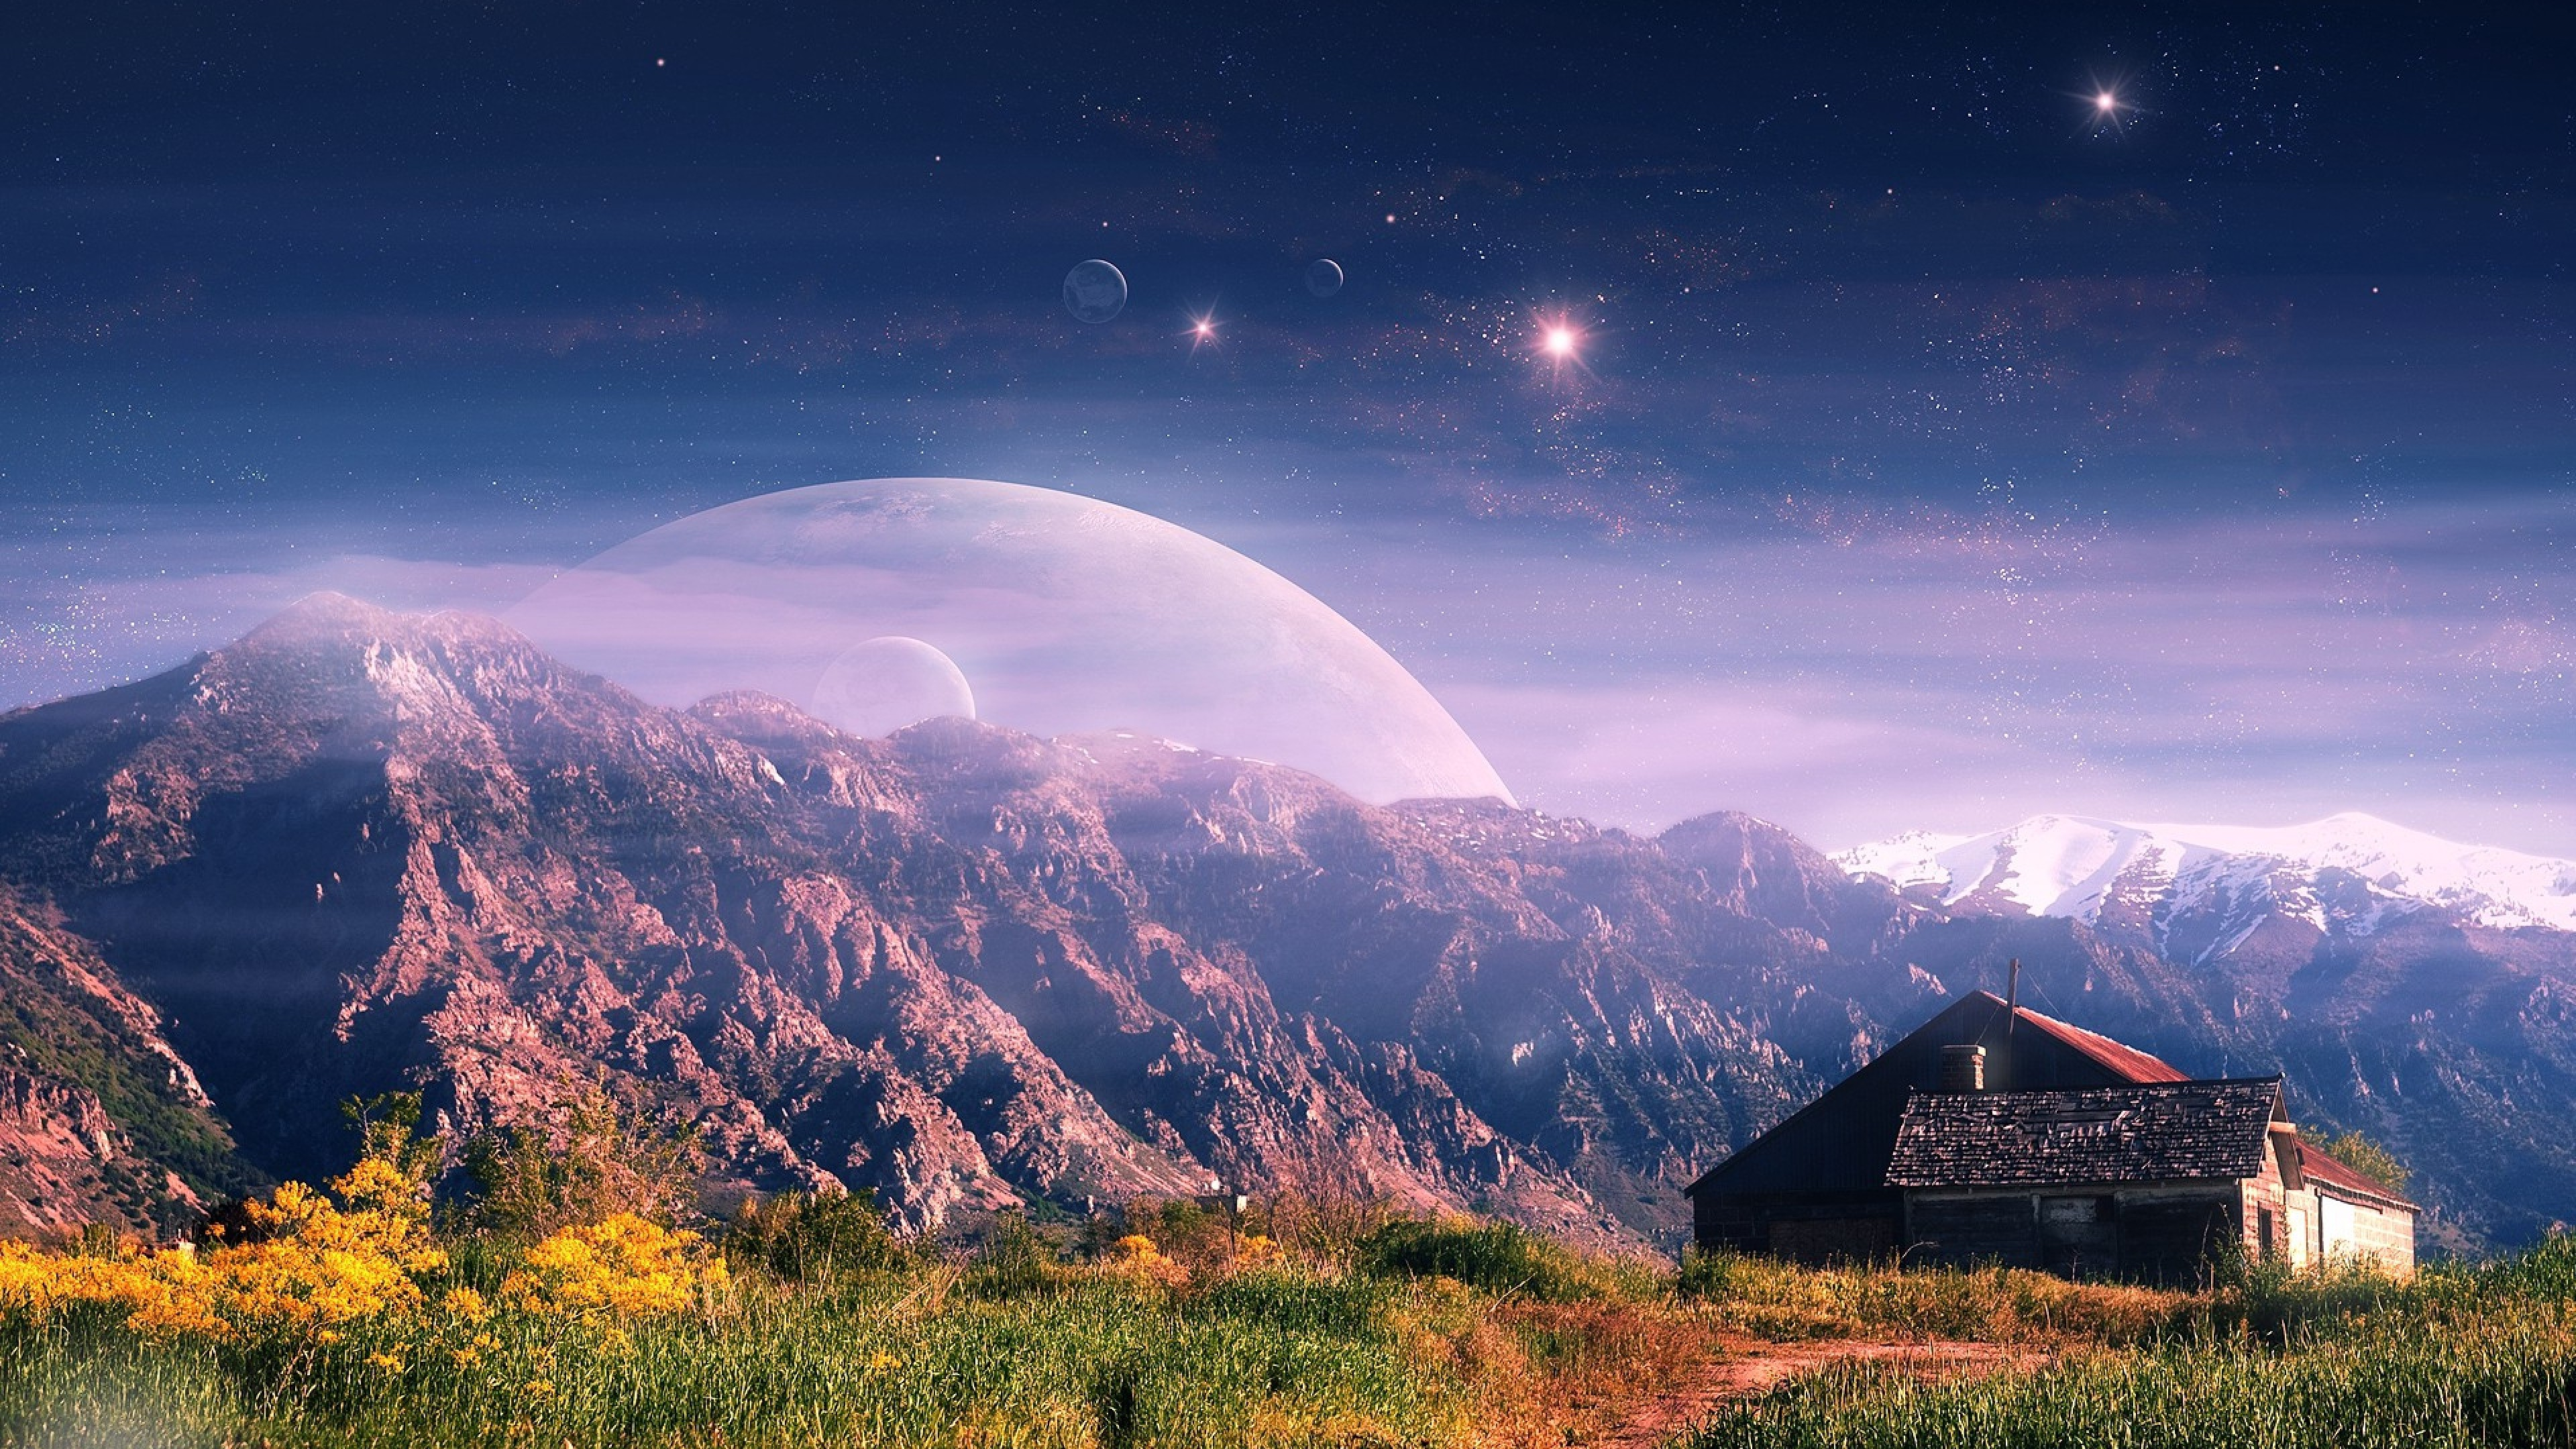 Must see Wallpaper Mountain Nokia - mountain-house-fantasy  Trends_856621.jpg